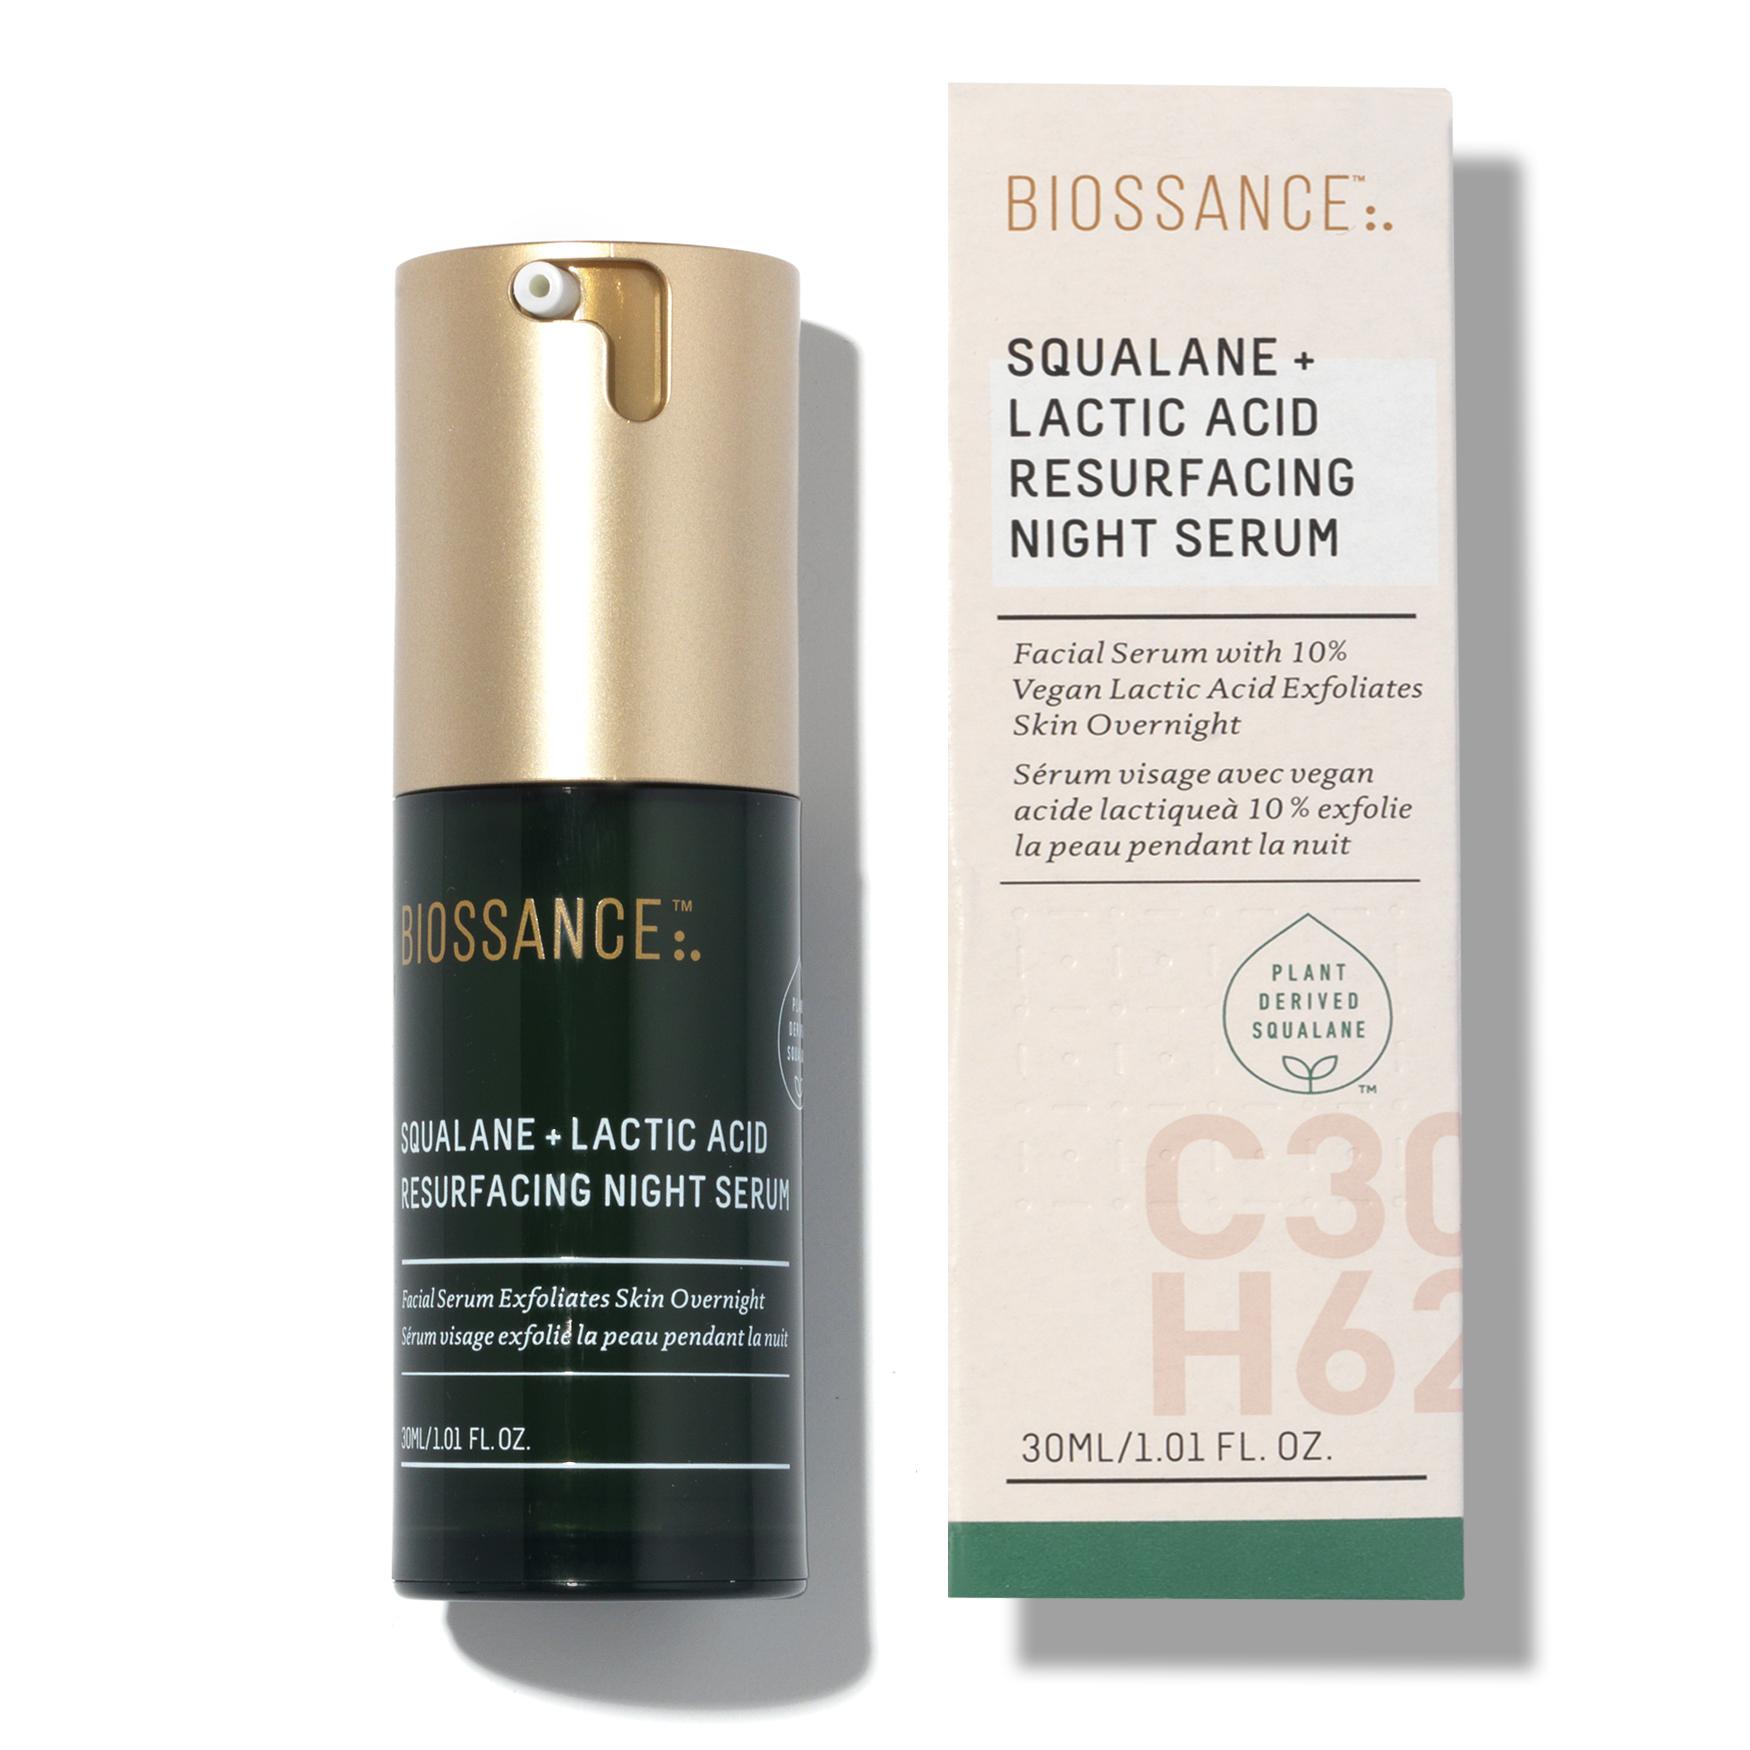 Squalane + Lactic Acid Resurfacing Night Serum